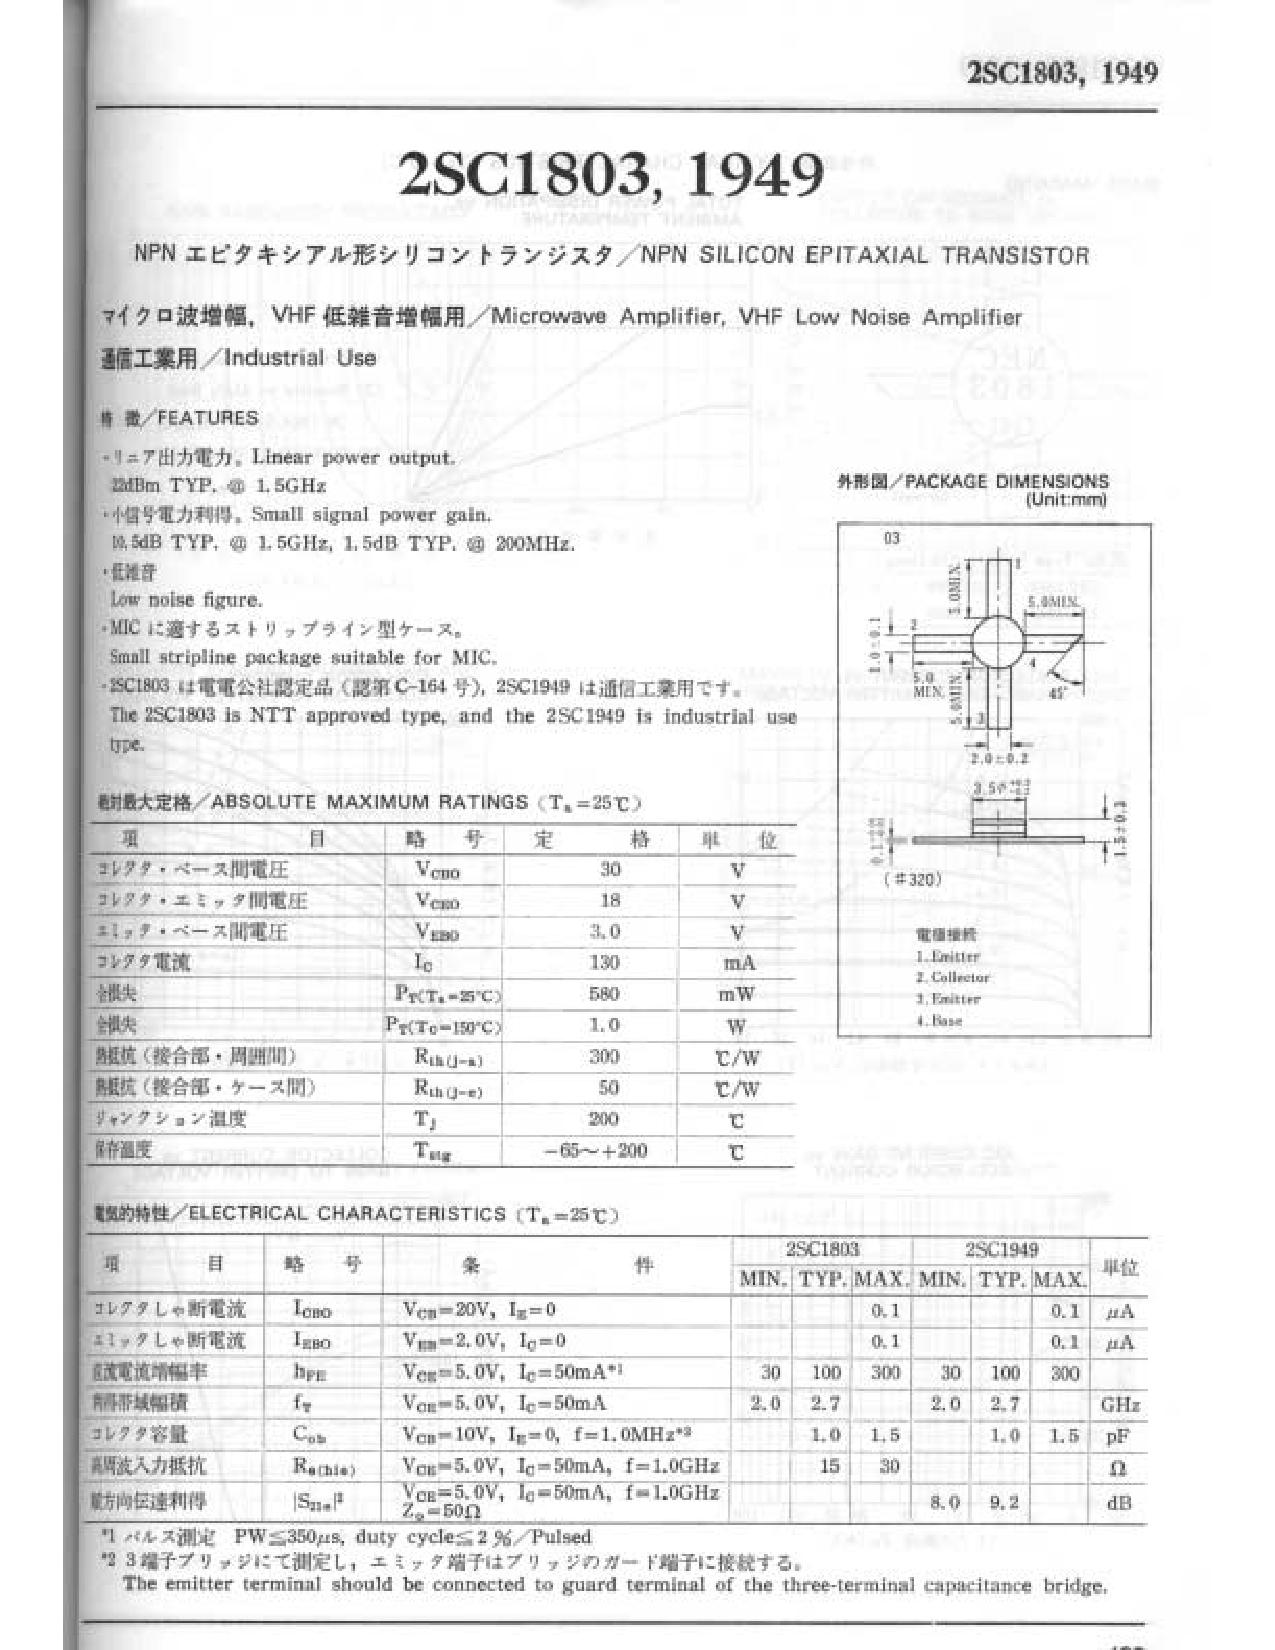 2SC1803 datasheet